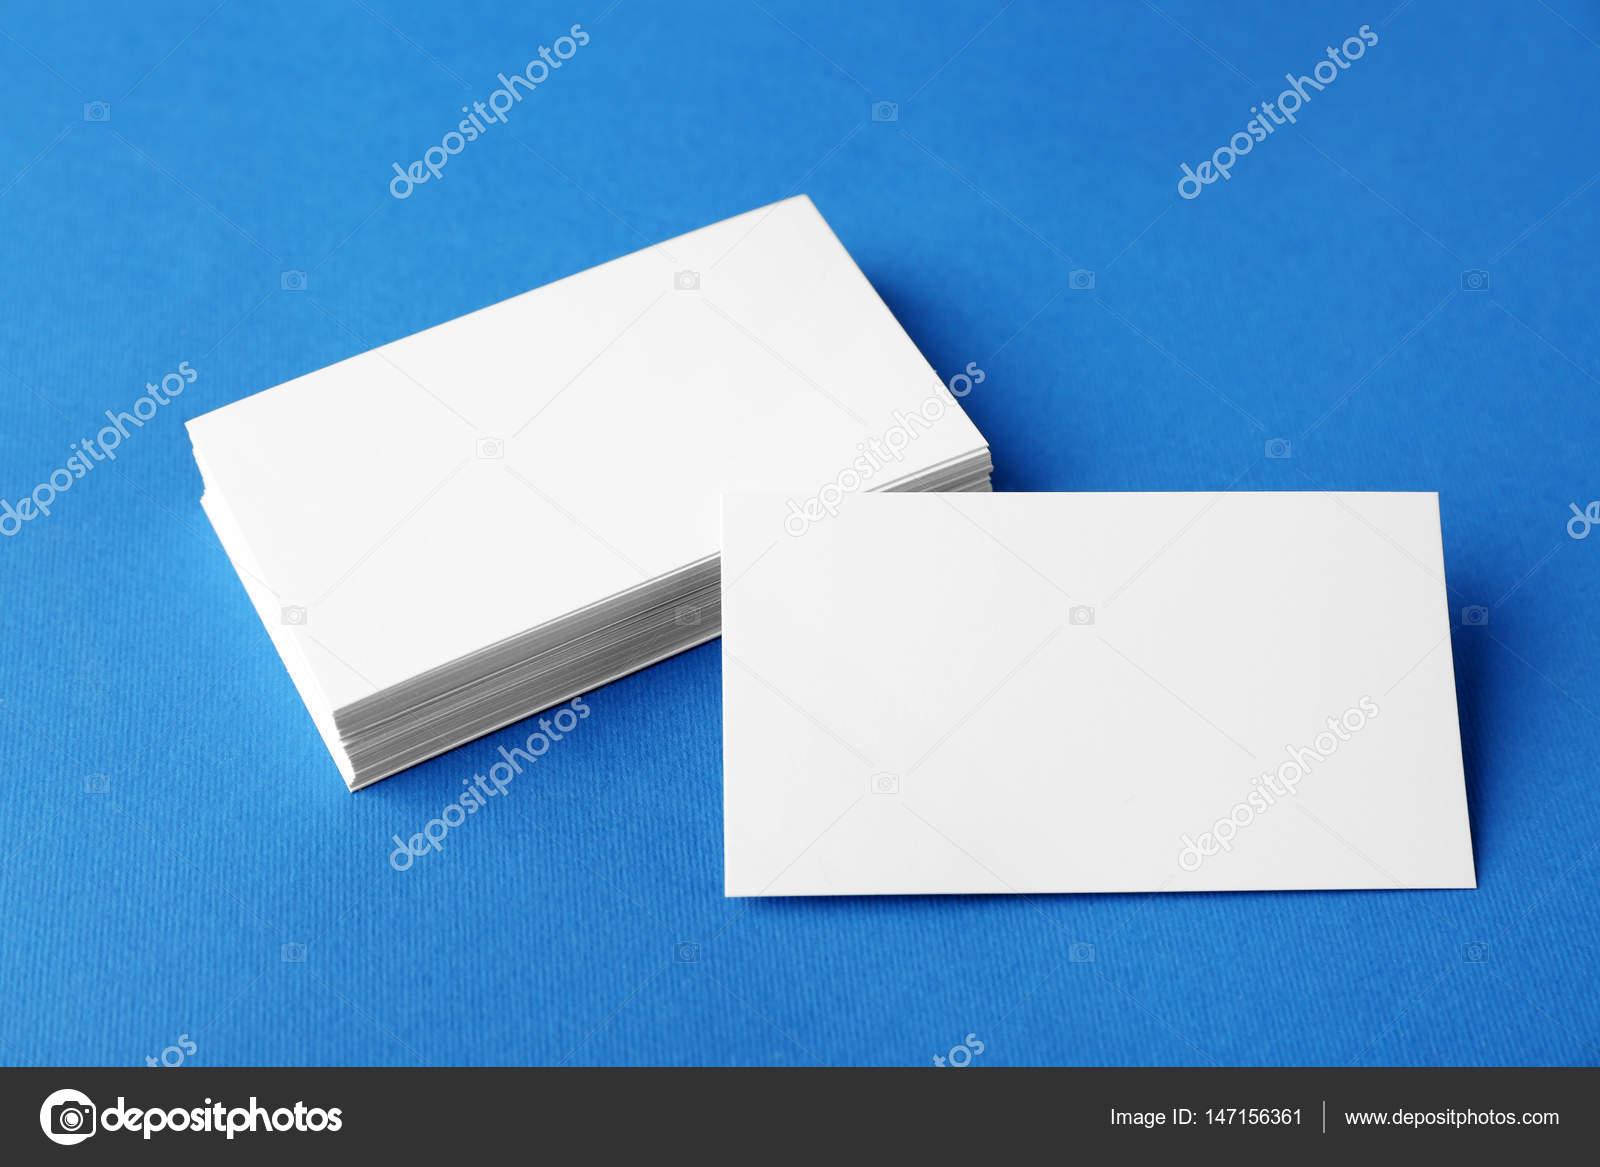 Blank business cards — Stock Photo © belchonock #147156361